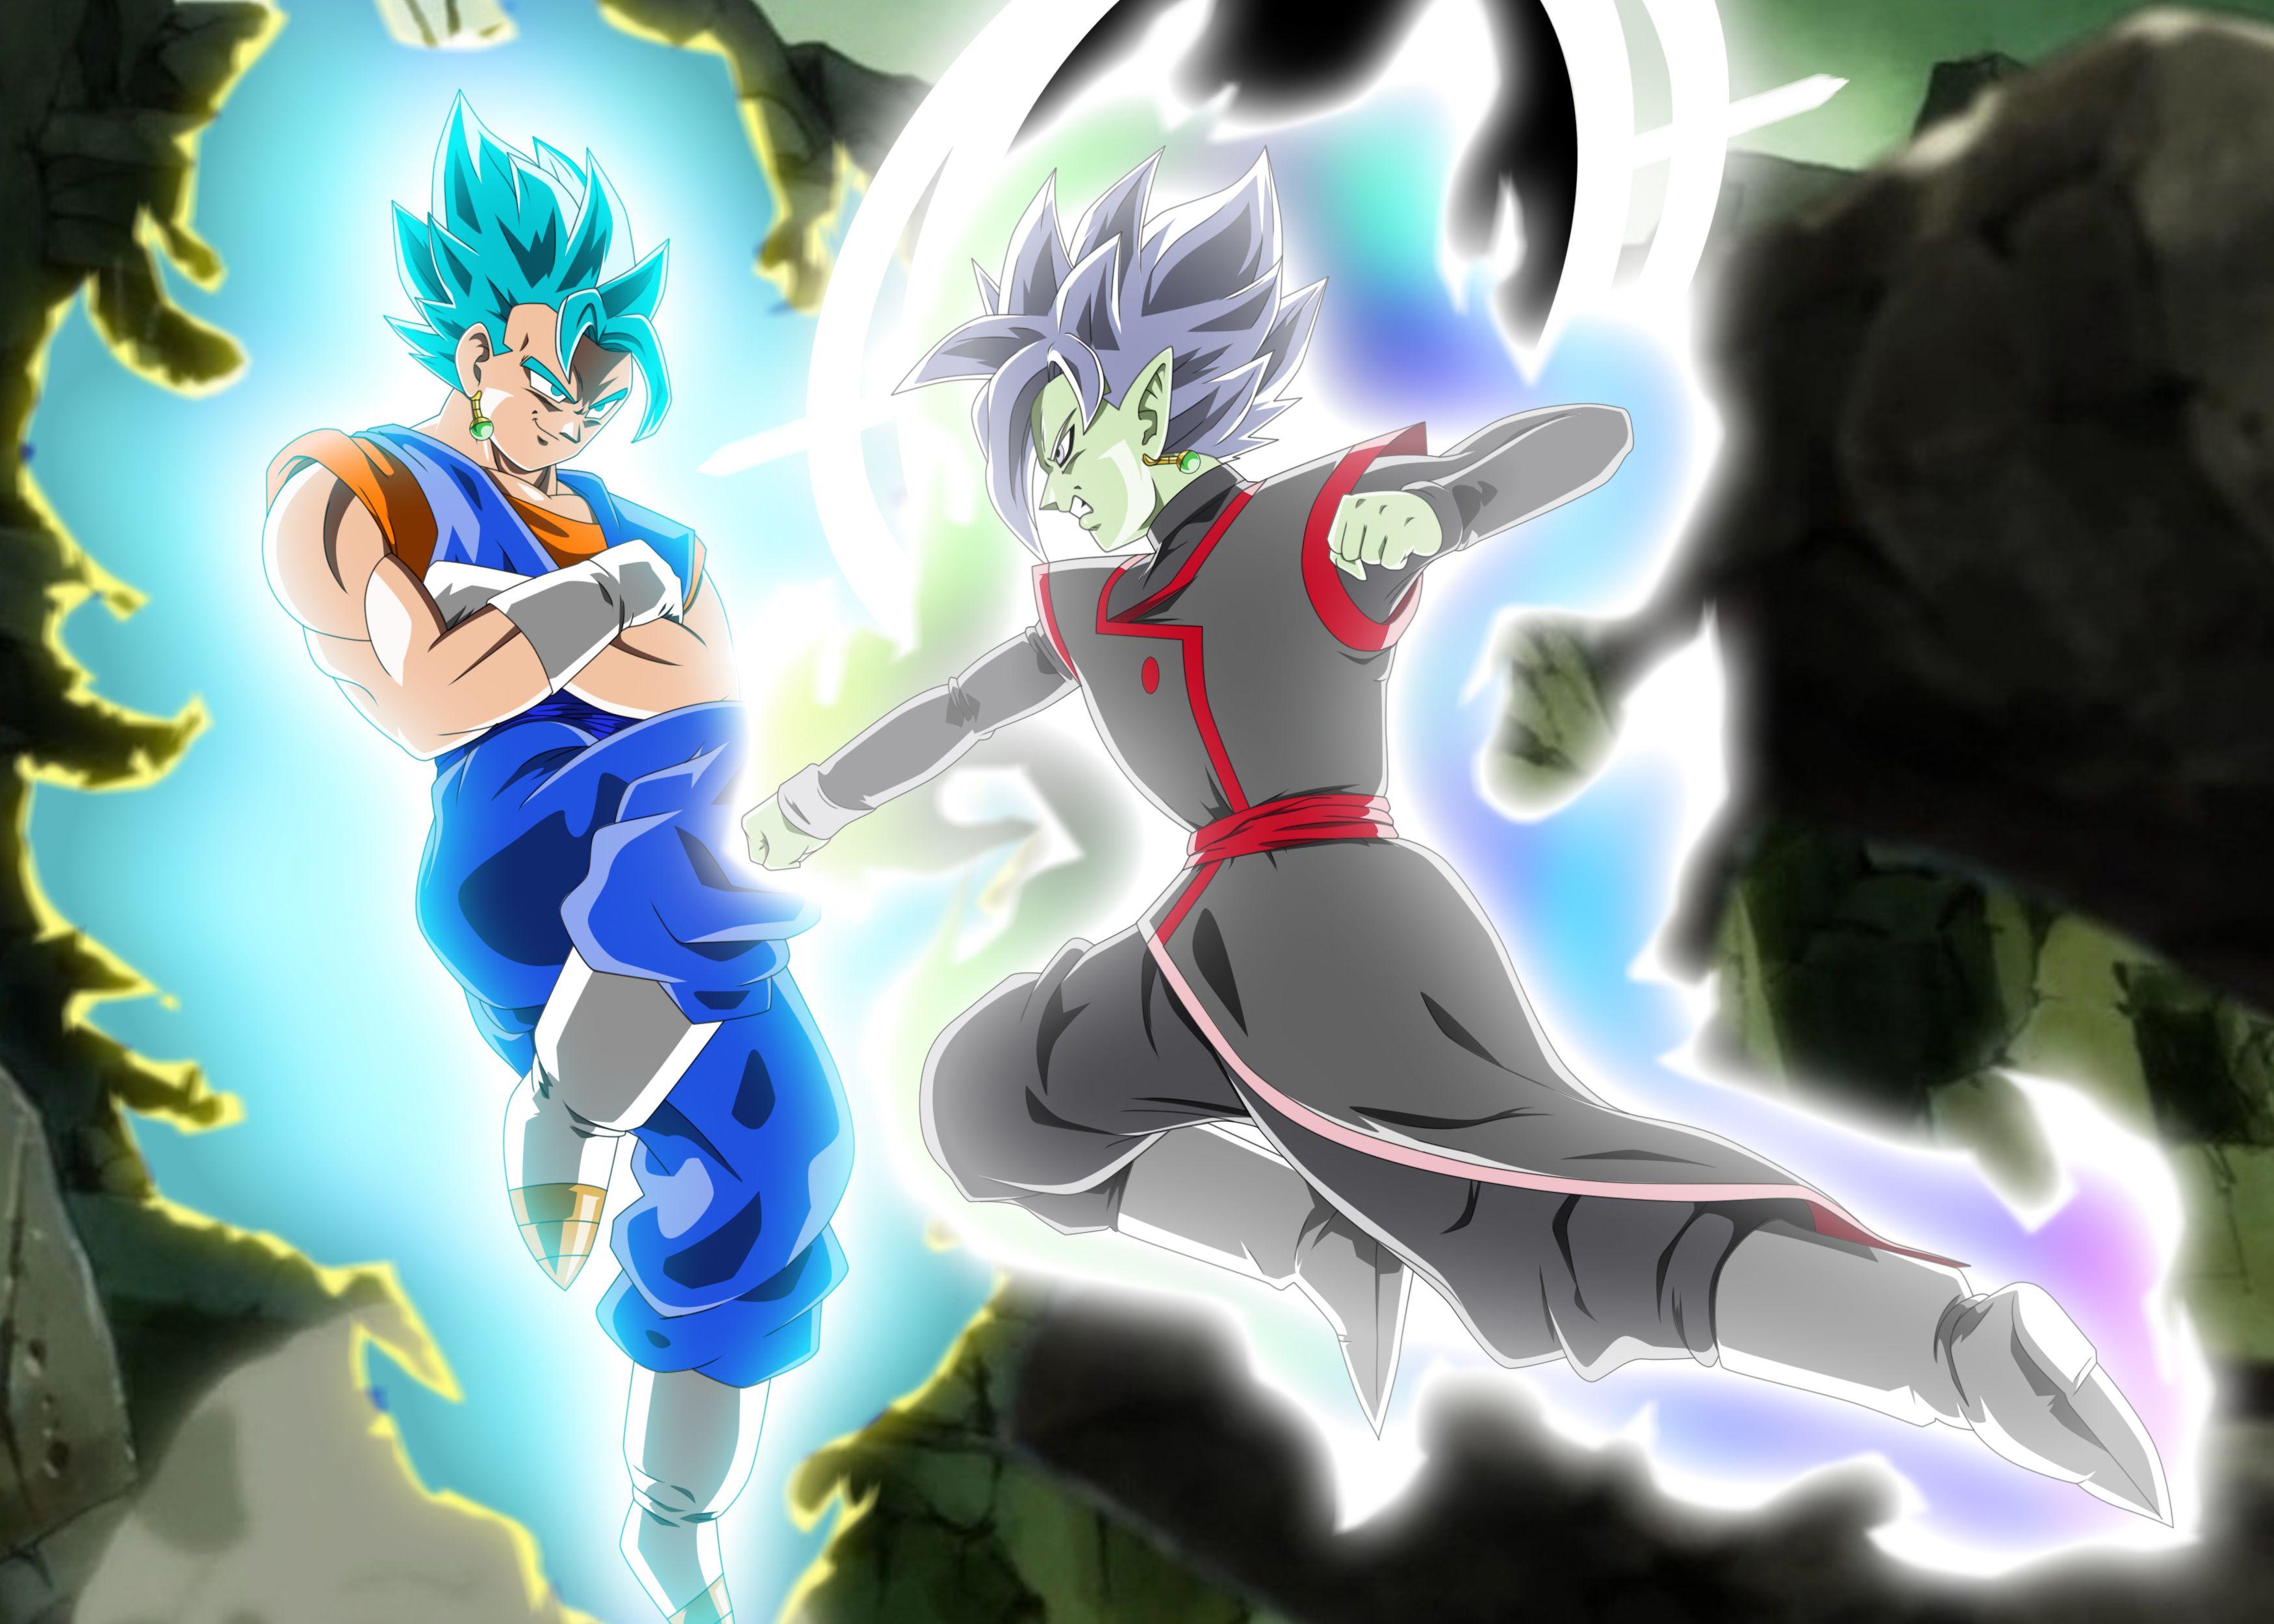 Vegetto Vs Zamasu By Akaggi Damg4nq Jpg 3500 2500 Dragon Ball Super Goku Dragon Ball Z Anime Dragon Ball